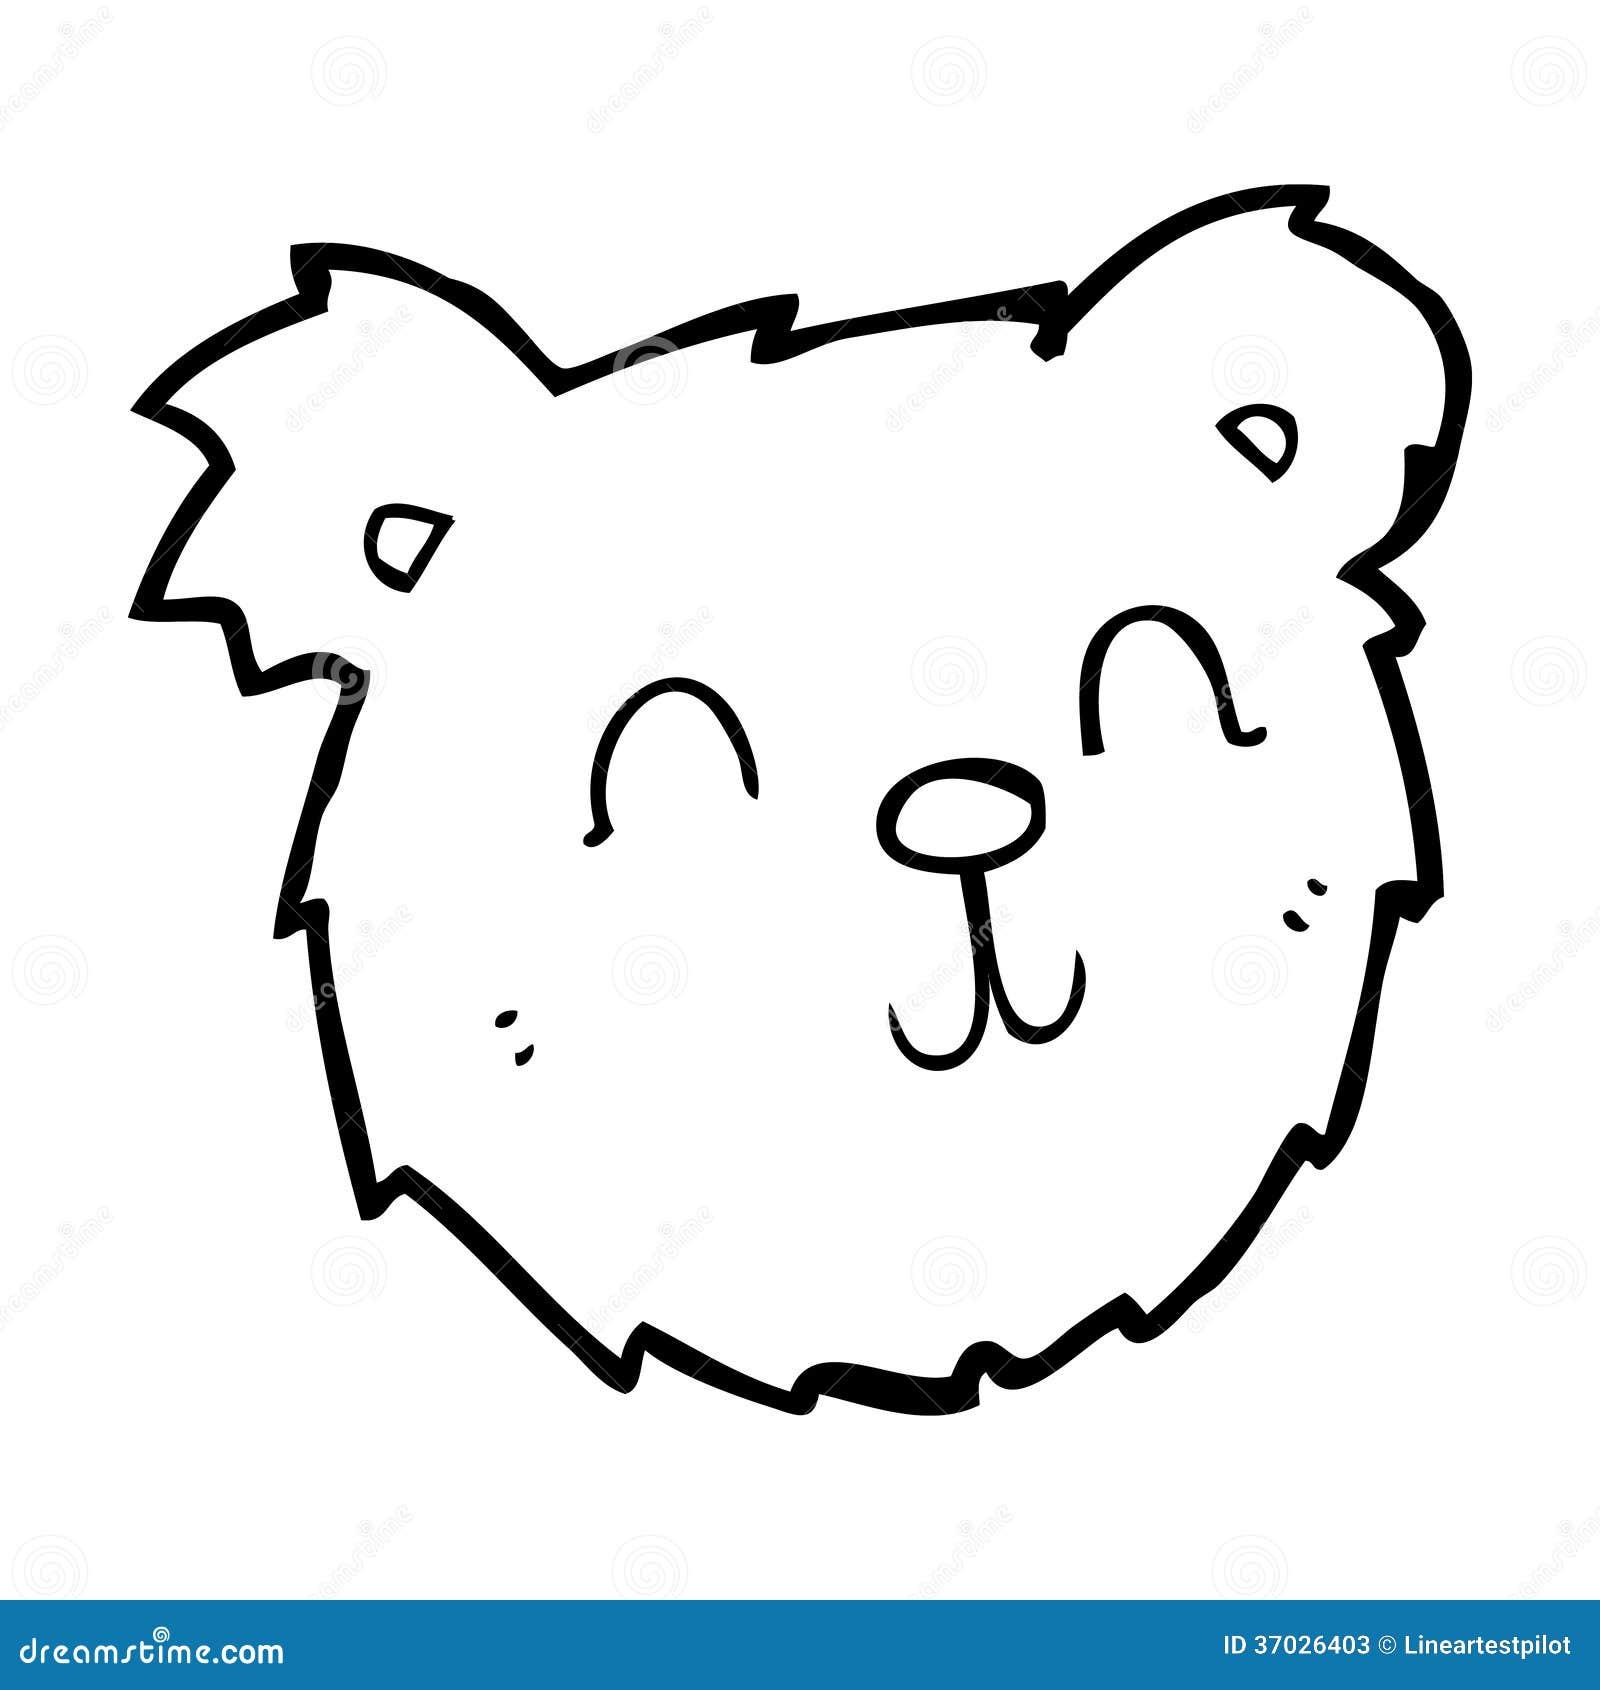 Bear Face Line Drawing : Cartoon happy teddy bear face stock illustration image